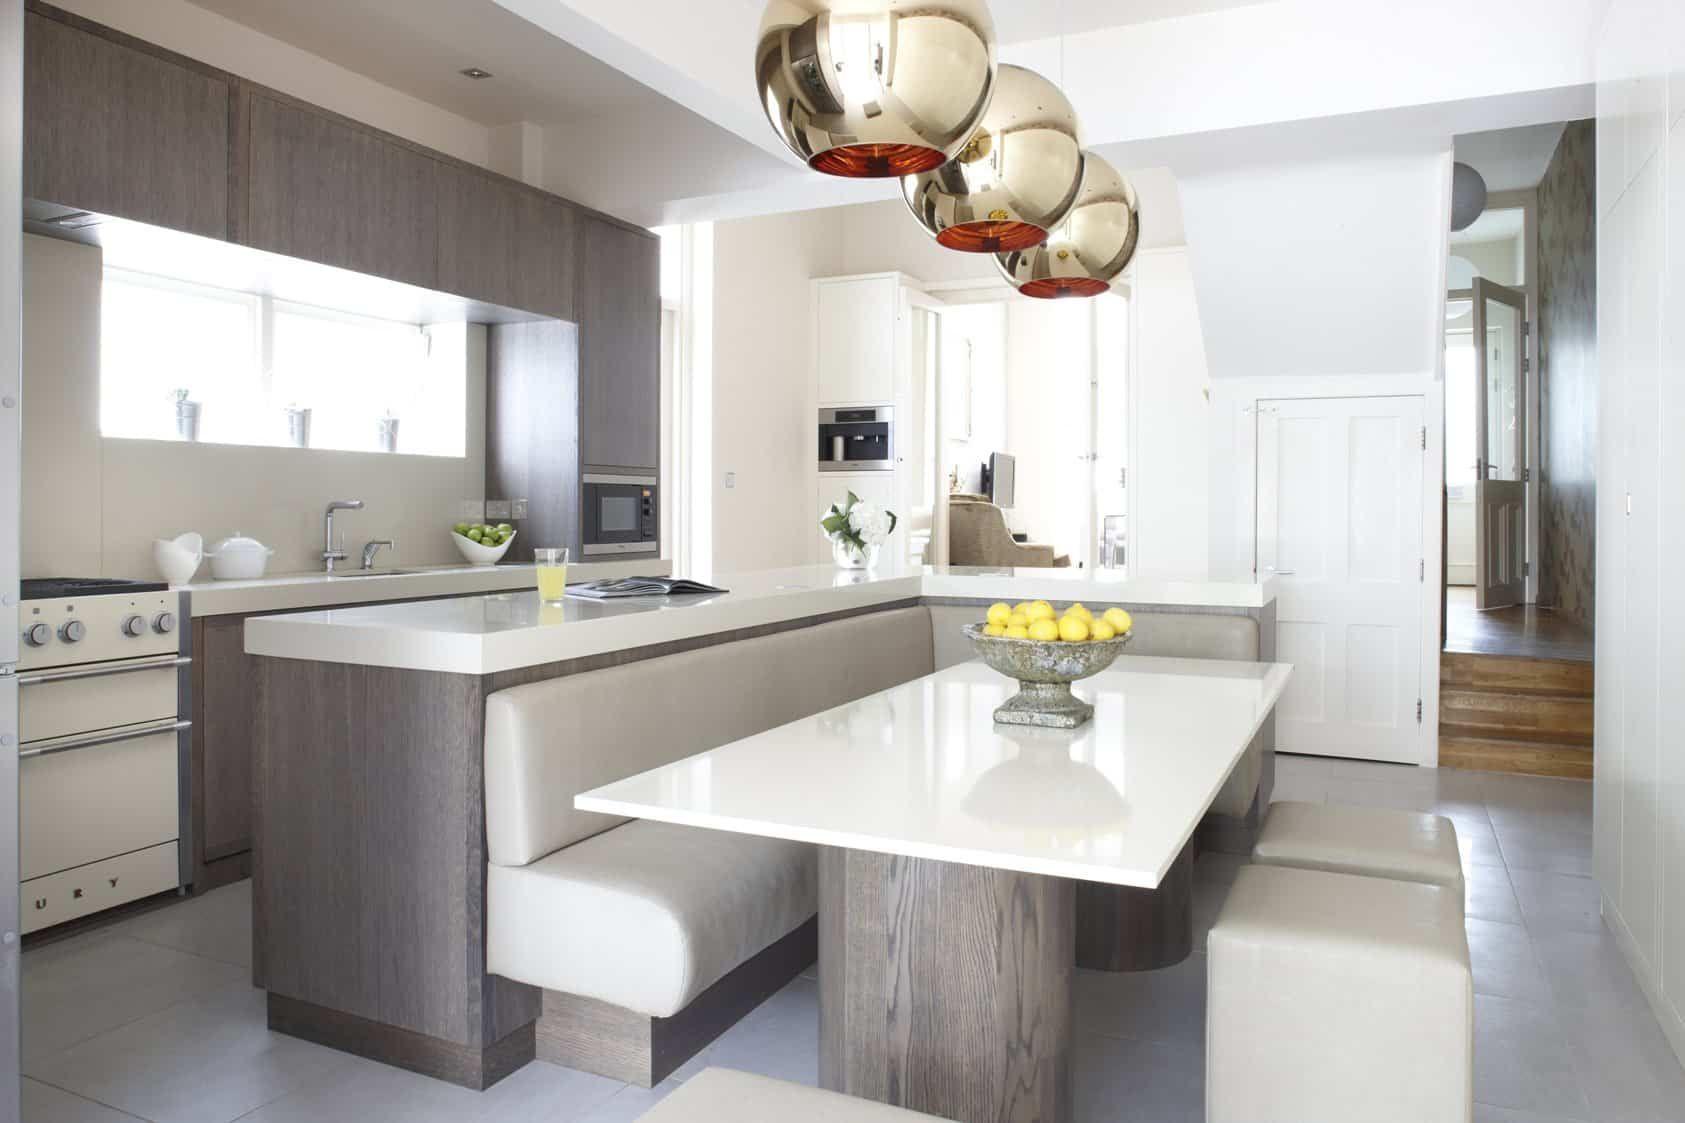 Bespoke Kitchen Design and Manufacturing